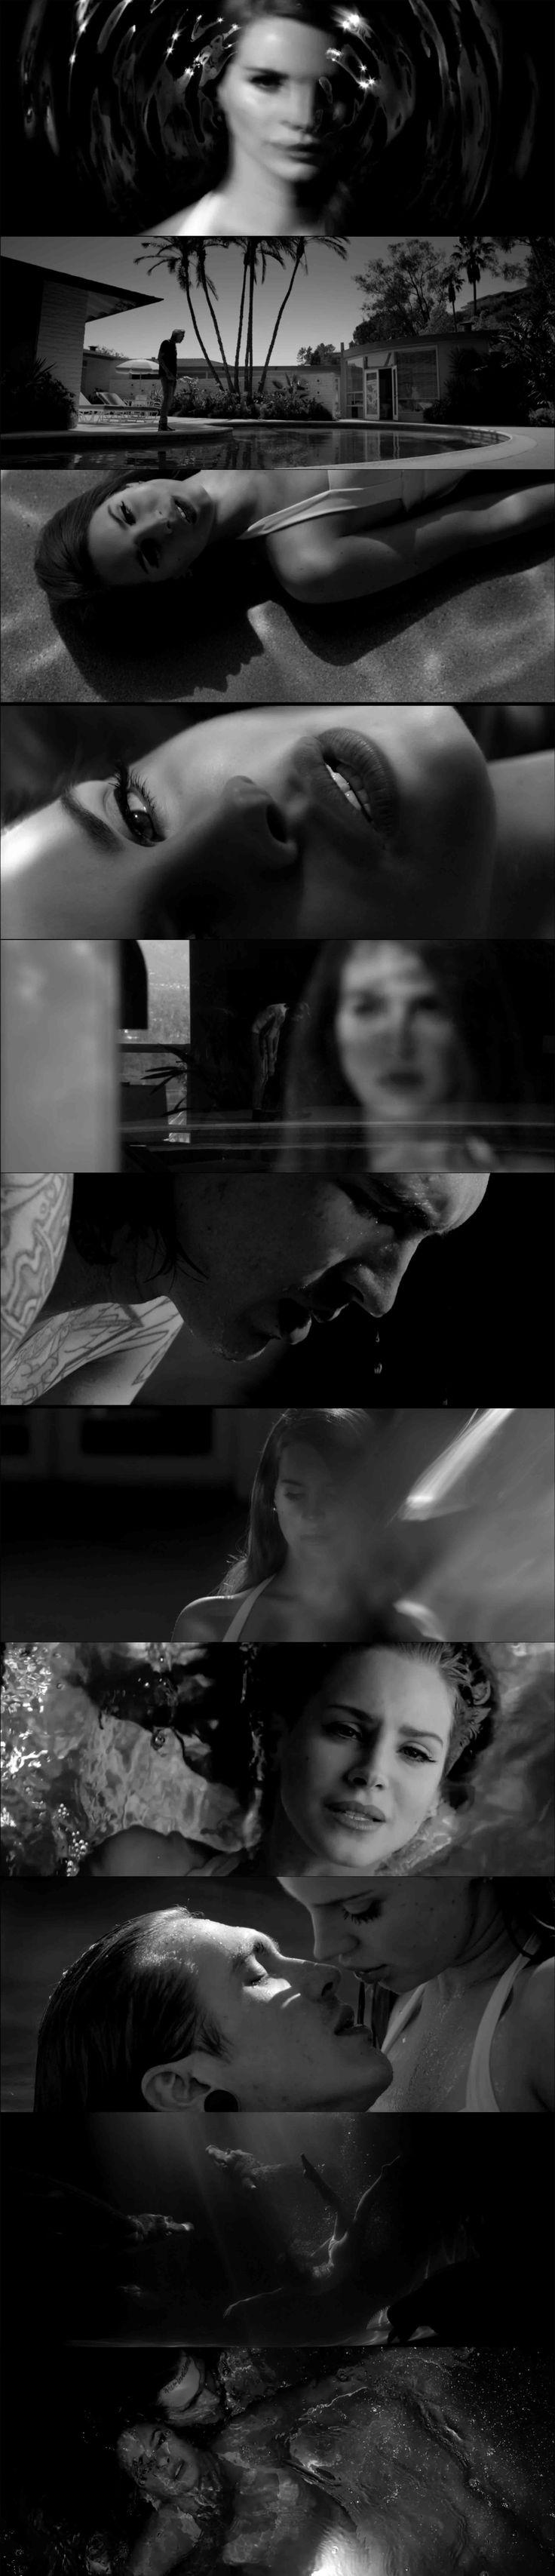 Lana Del Rey's 'Blue Jeans' Music Video, Cinematography by Rodrigo Prieto